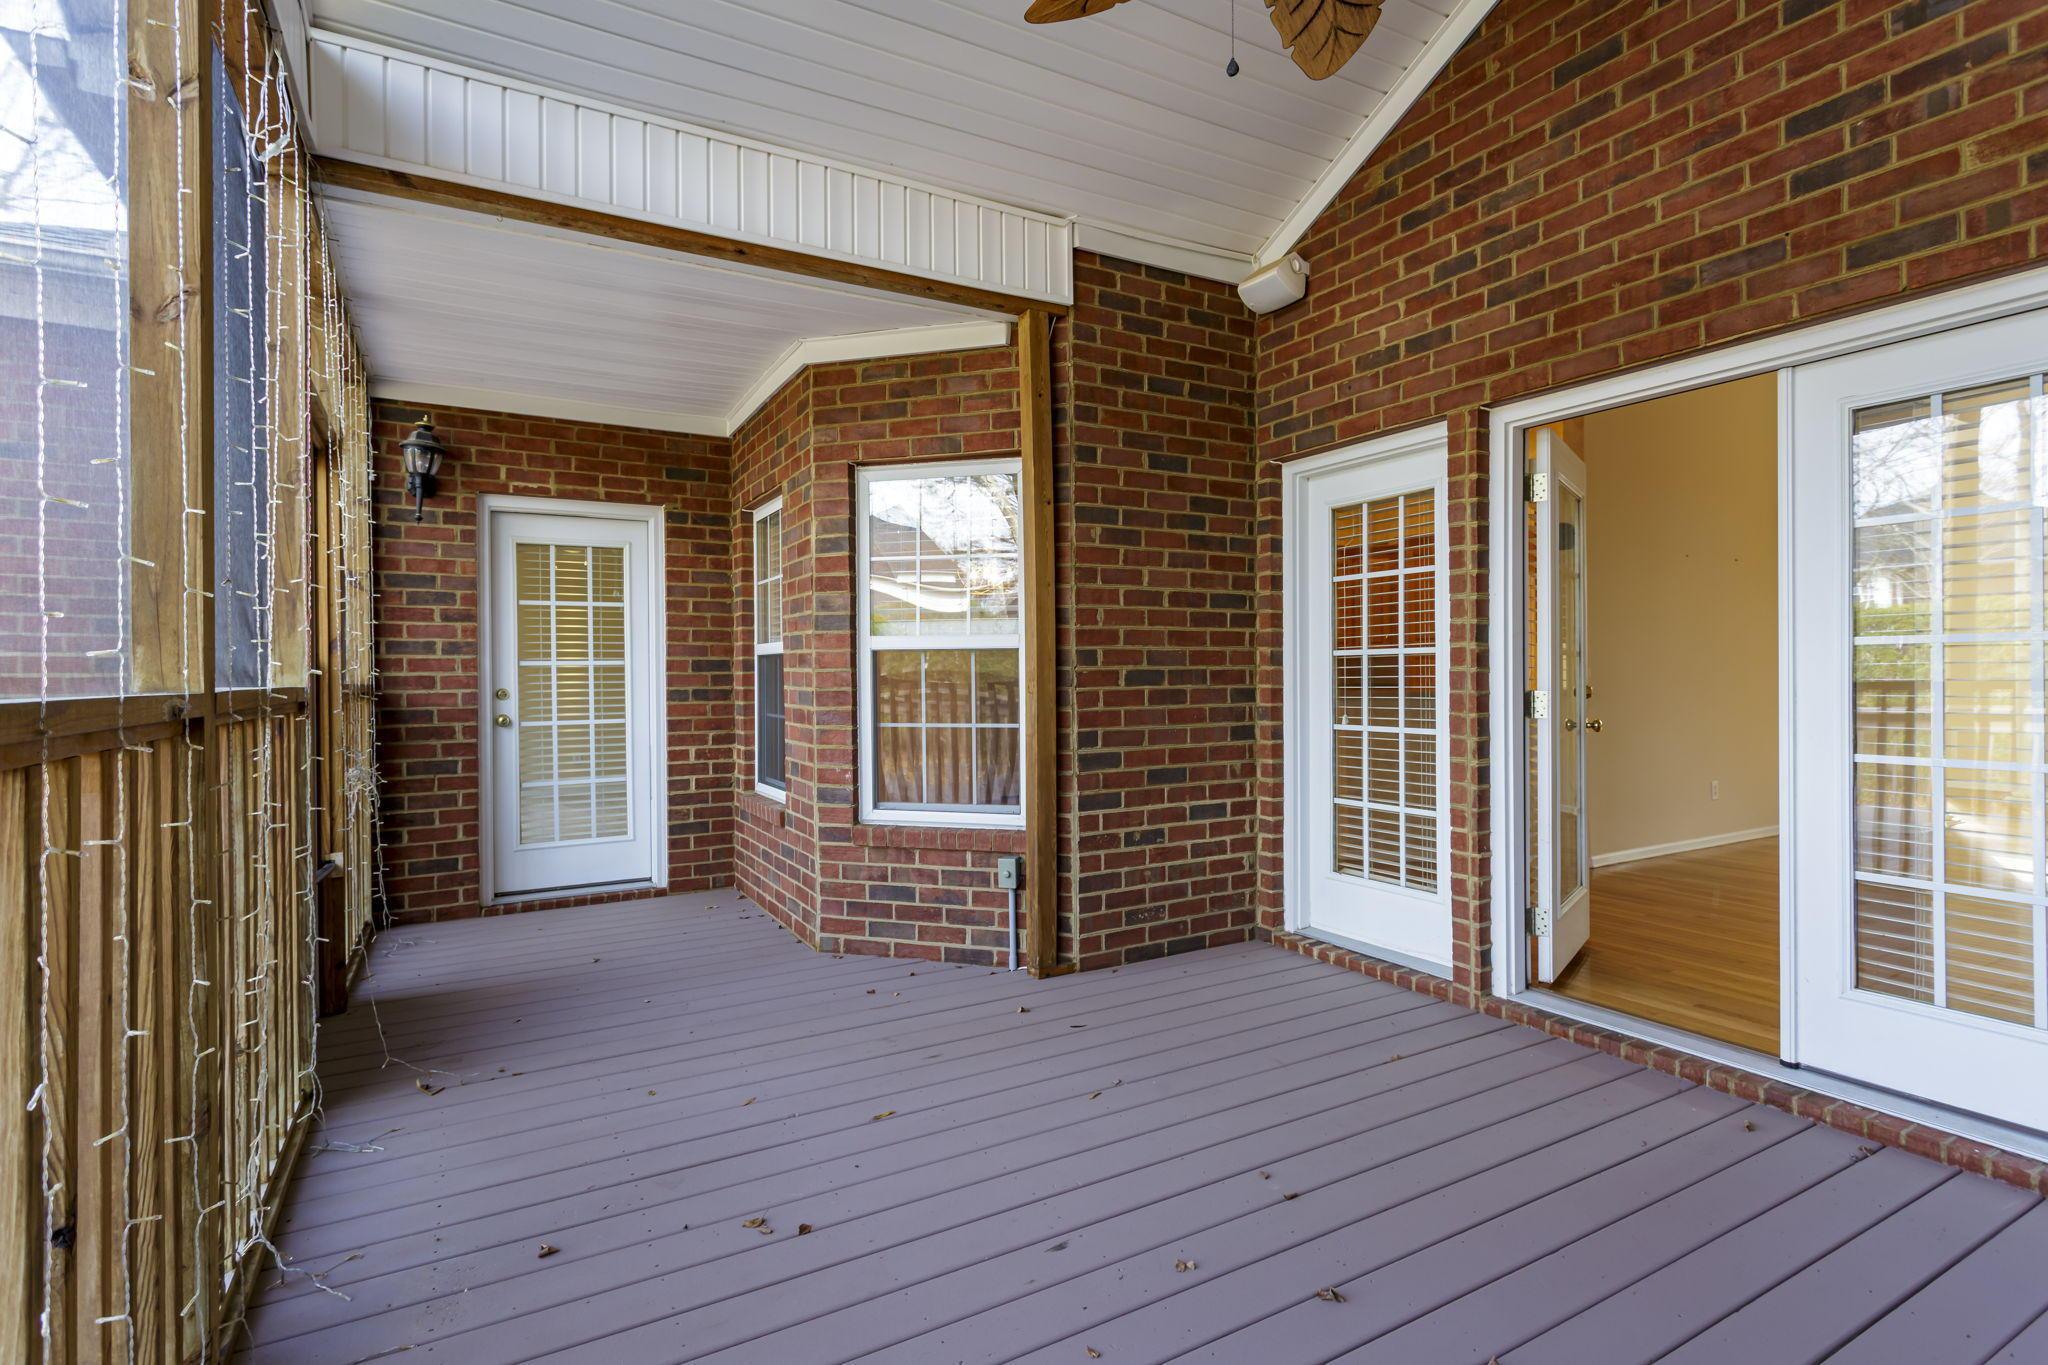 Crowfield Plantation Homes For Sale - 111 Thames, Goose Creek, SC - 22